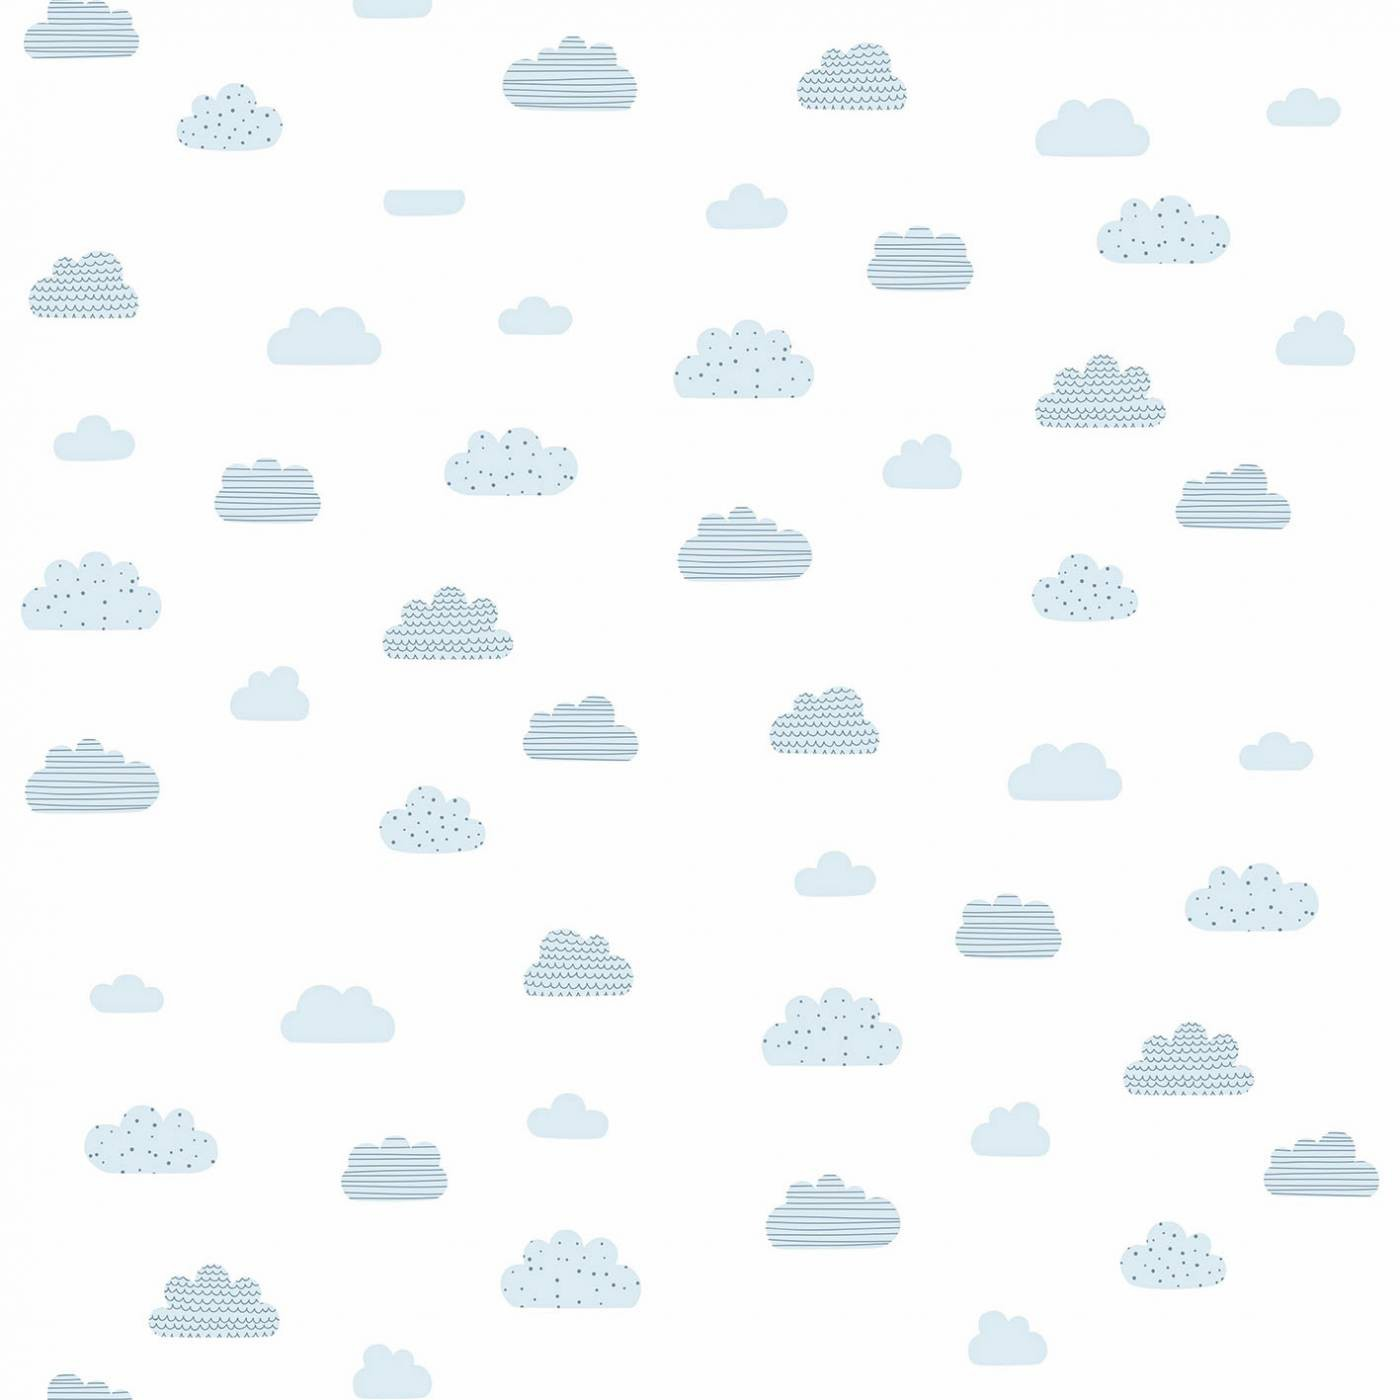 Papel de Parede Nuvens Azul Fundo Branco